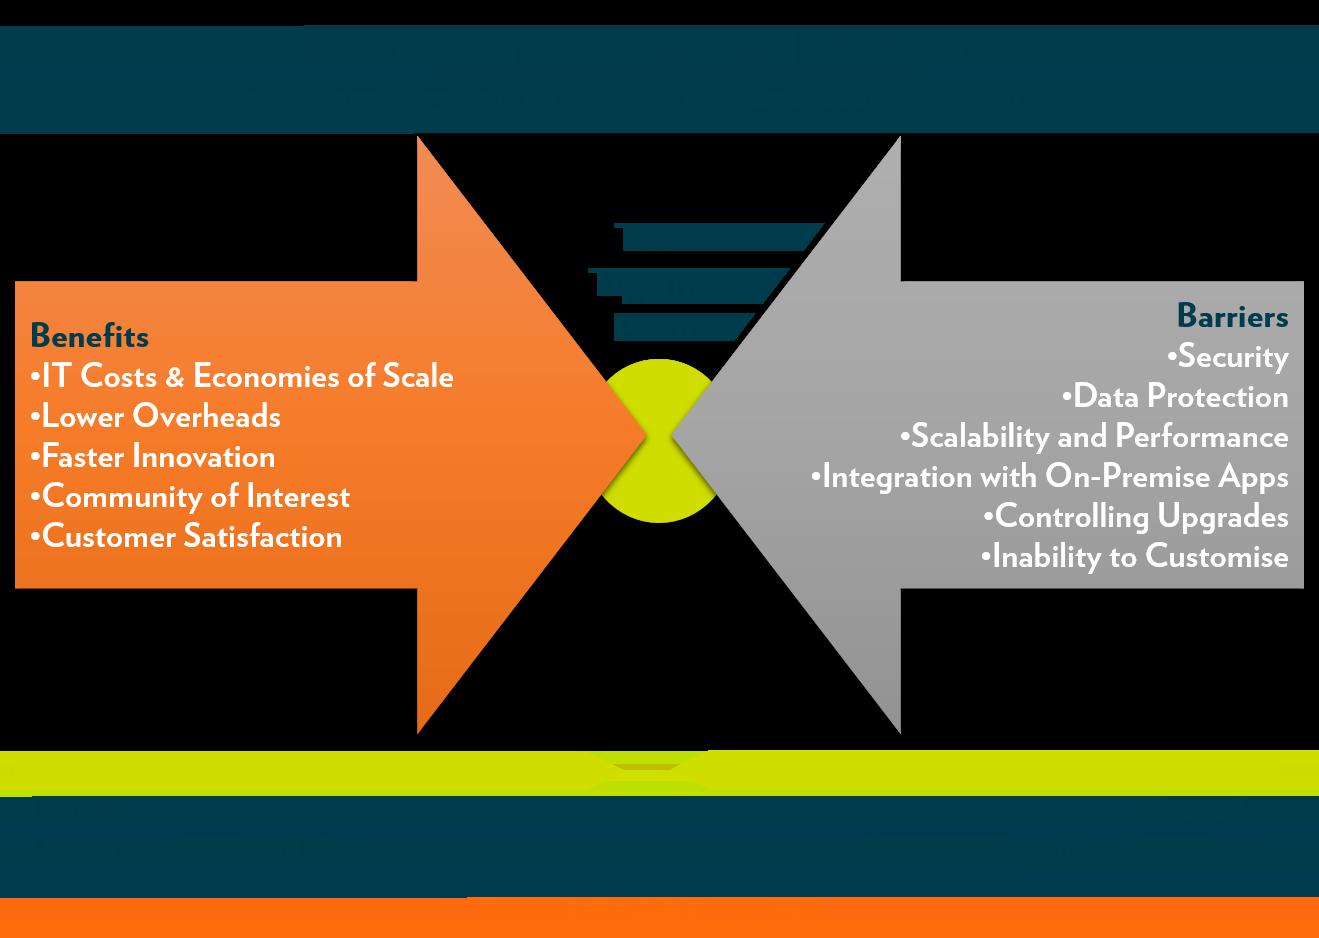 Fosway cloud saas force field analysis fosway group europes fosway cloud saas force field analysis pooptronica Gallery